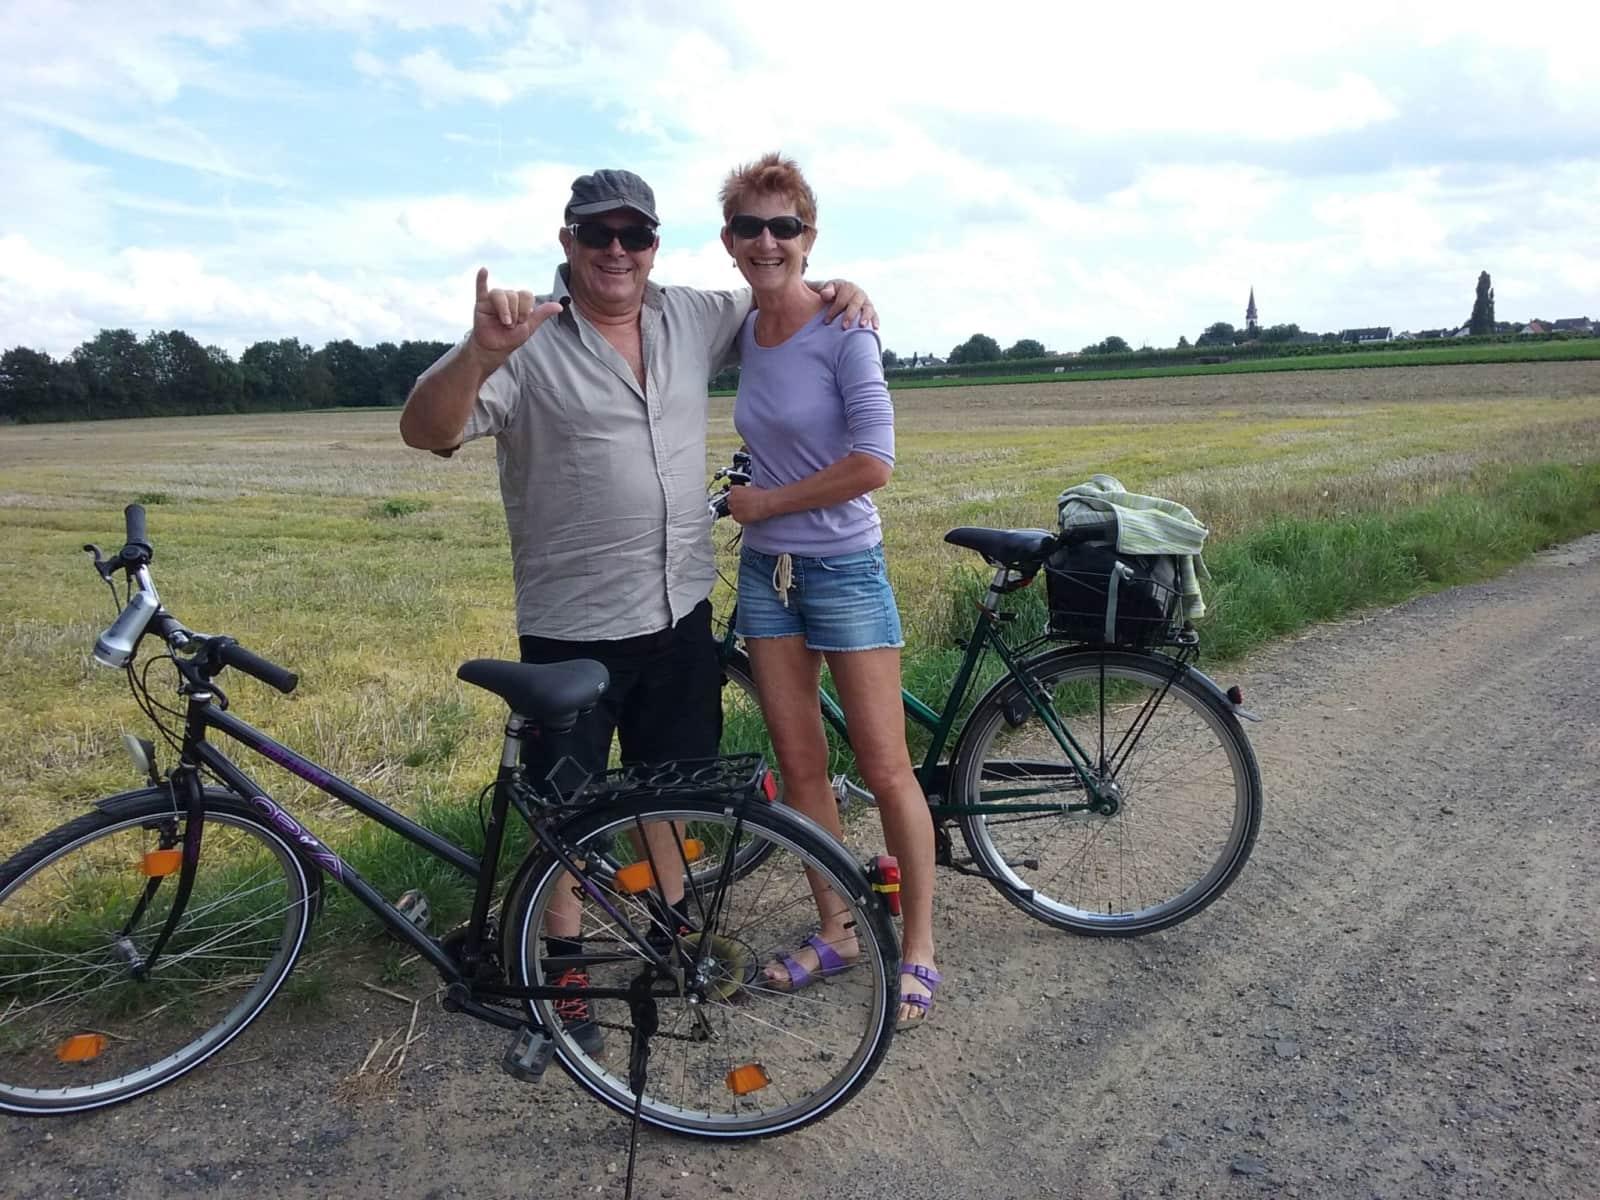 Astrid & Rene from Ballina, New South Wales, Australia